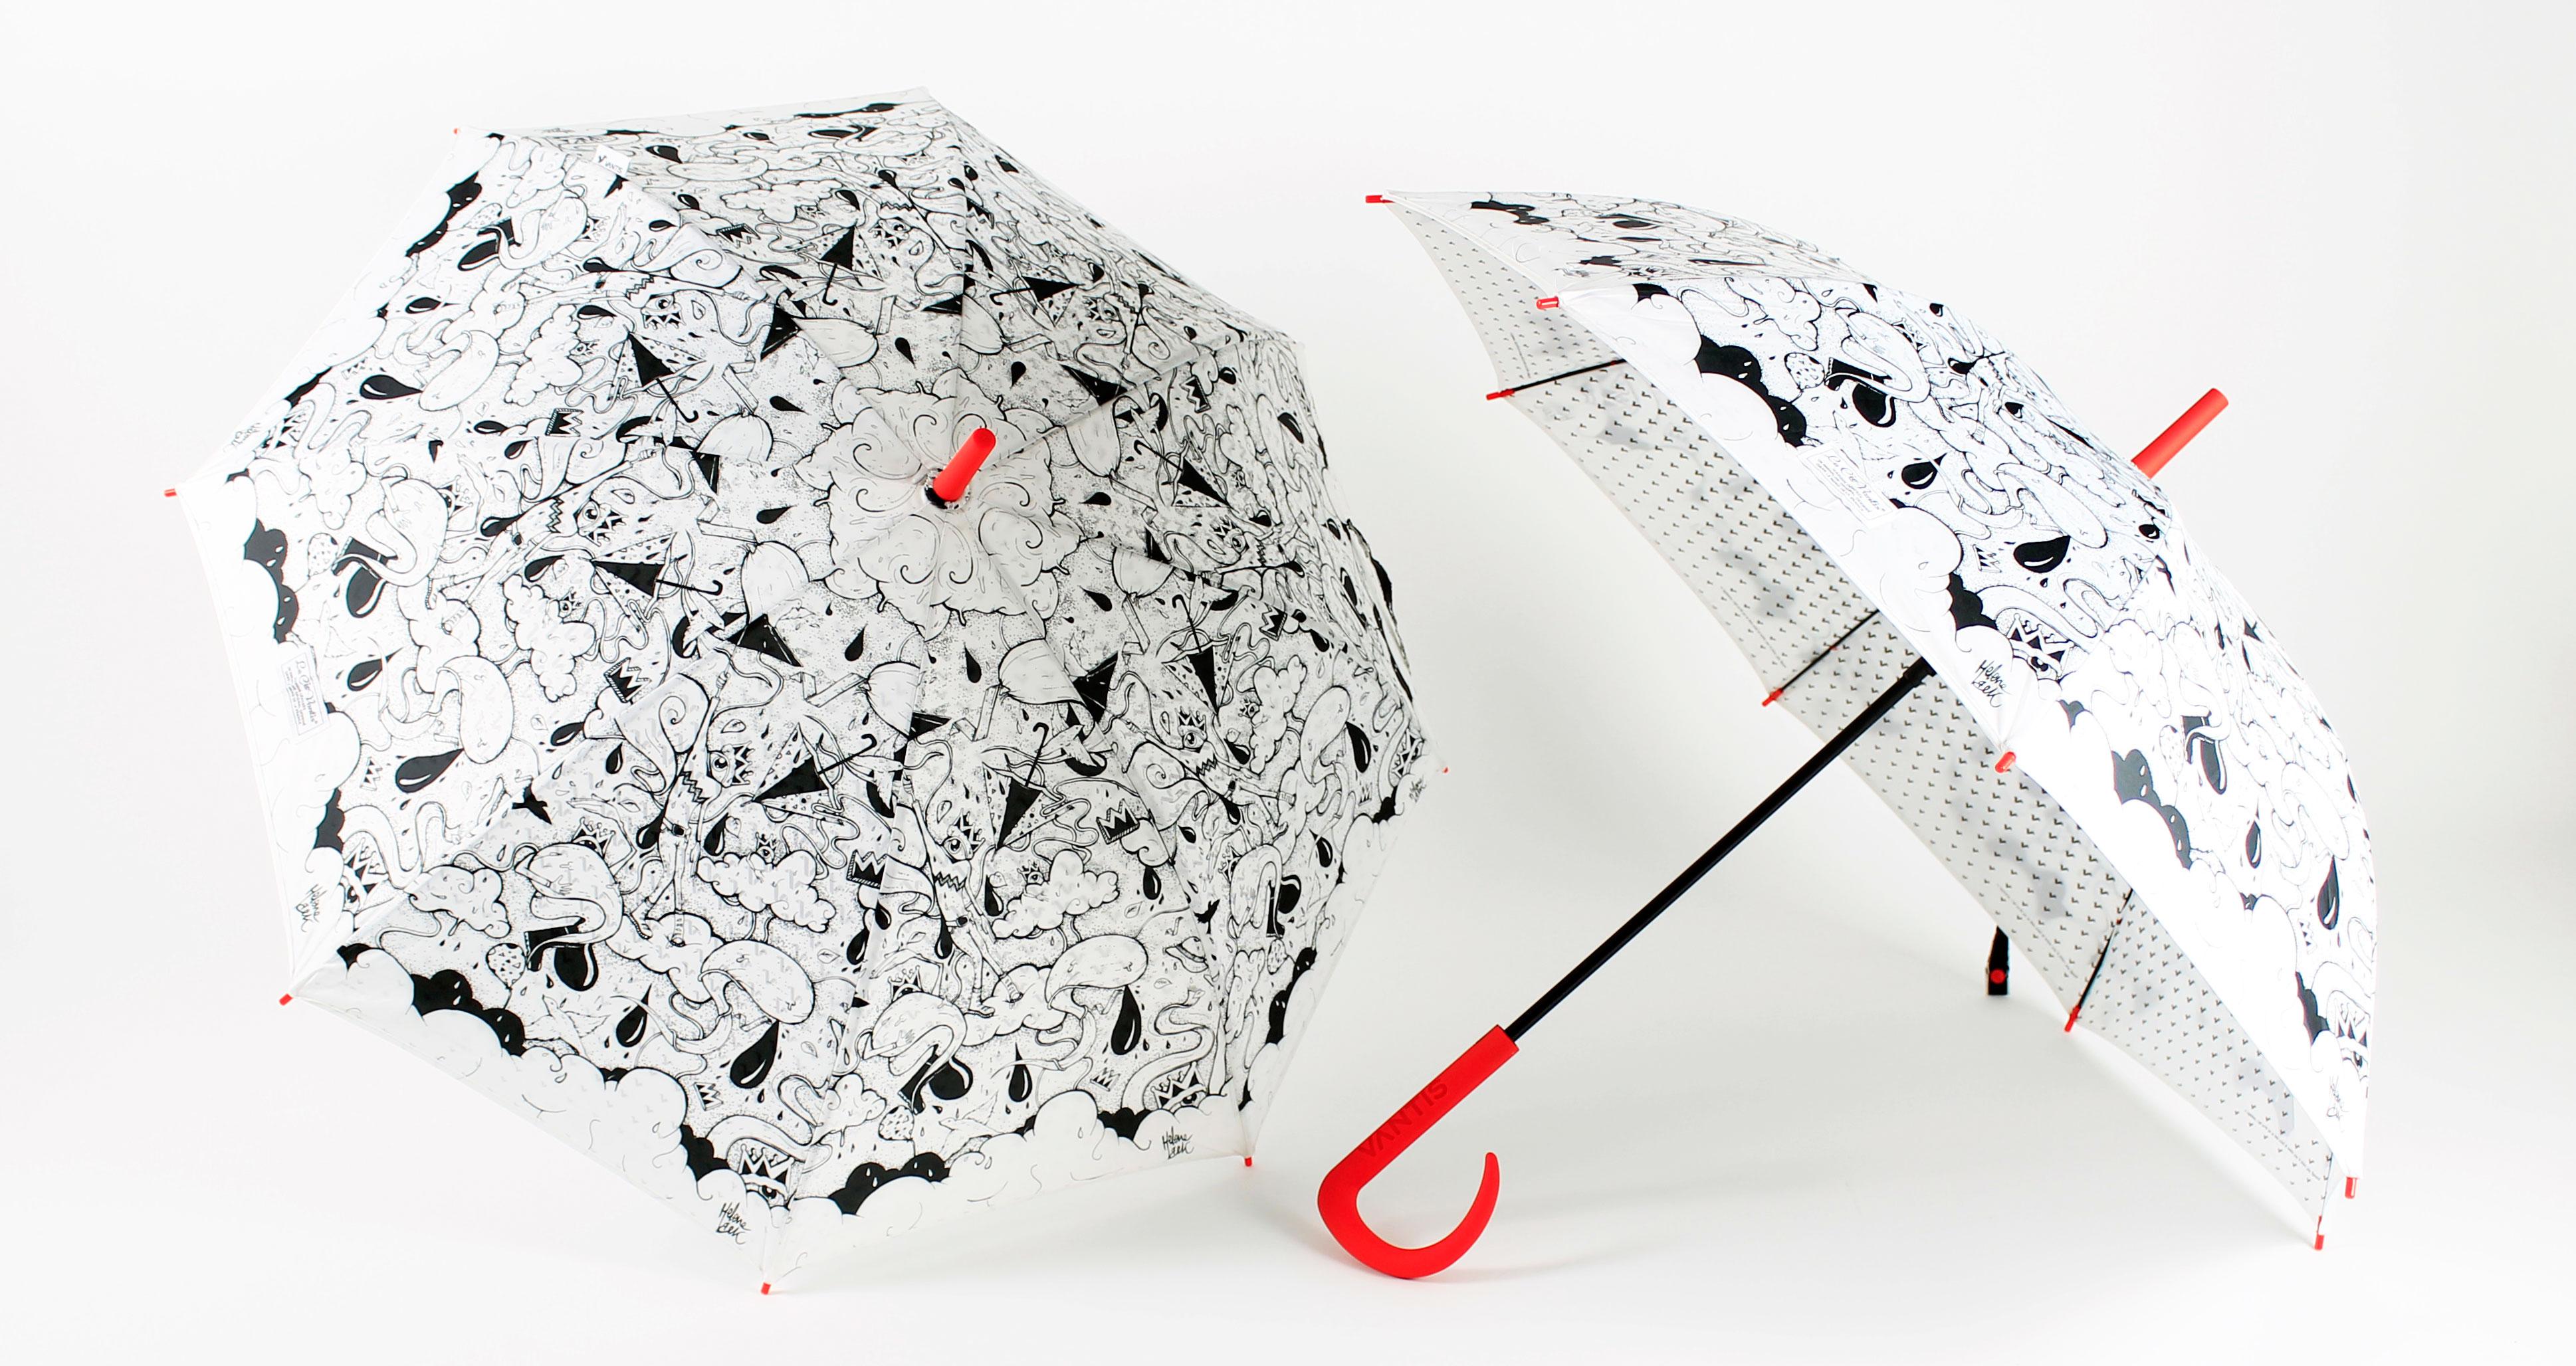 parapluies mode